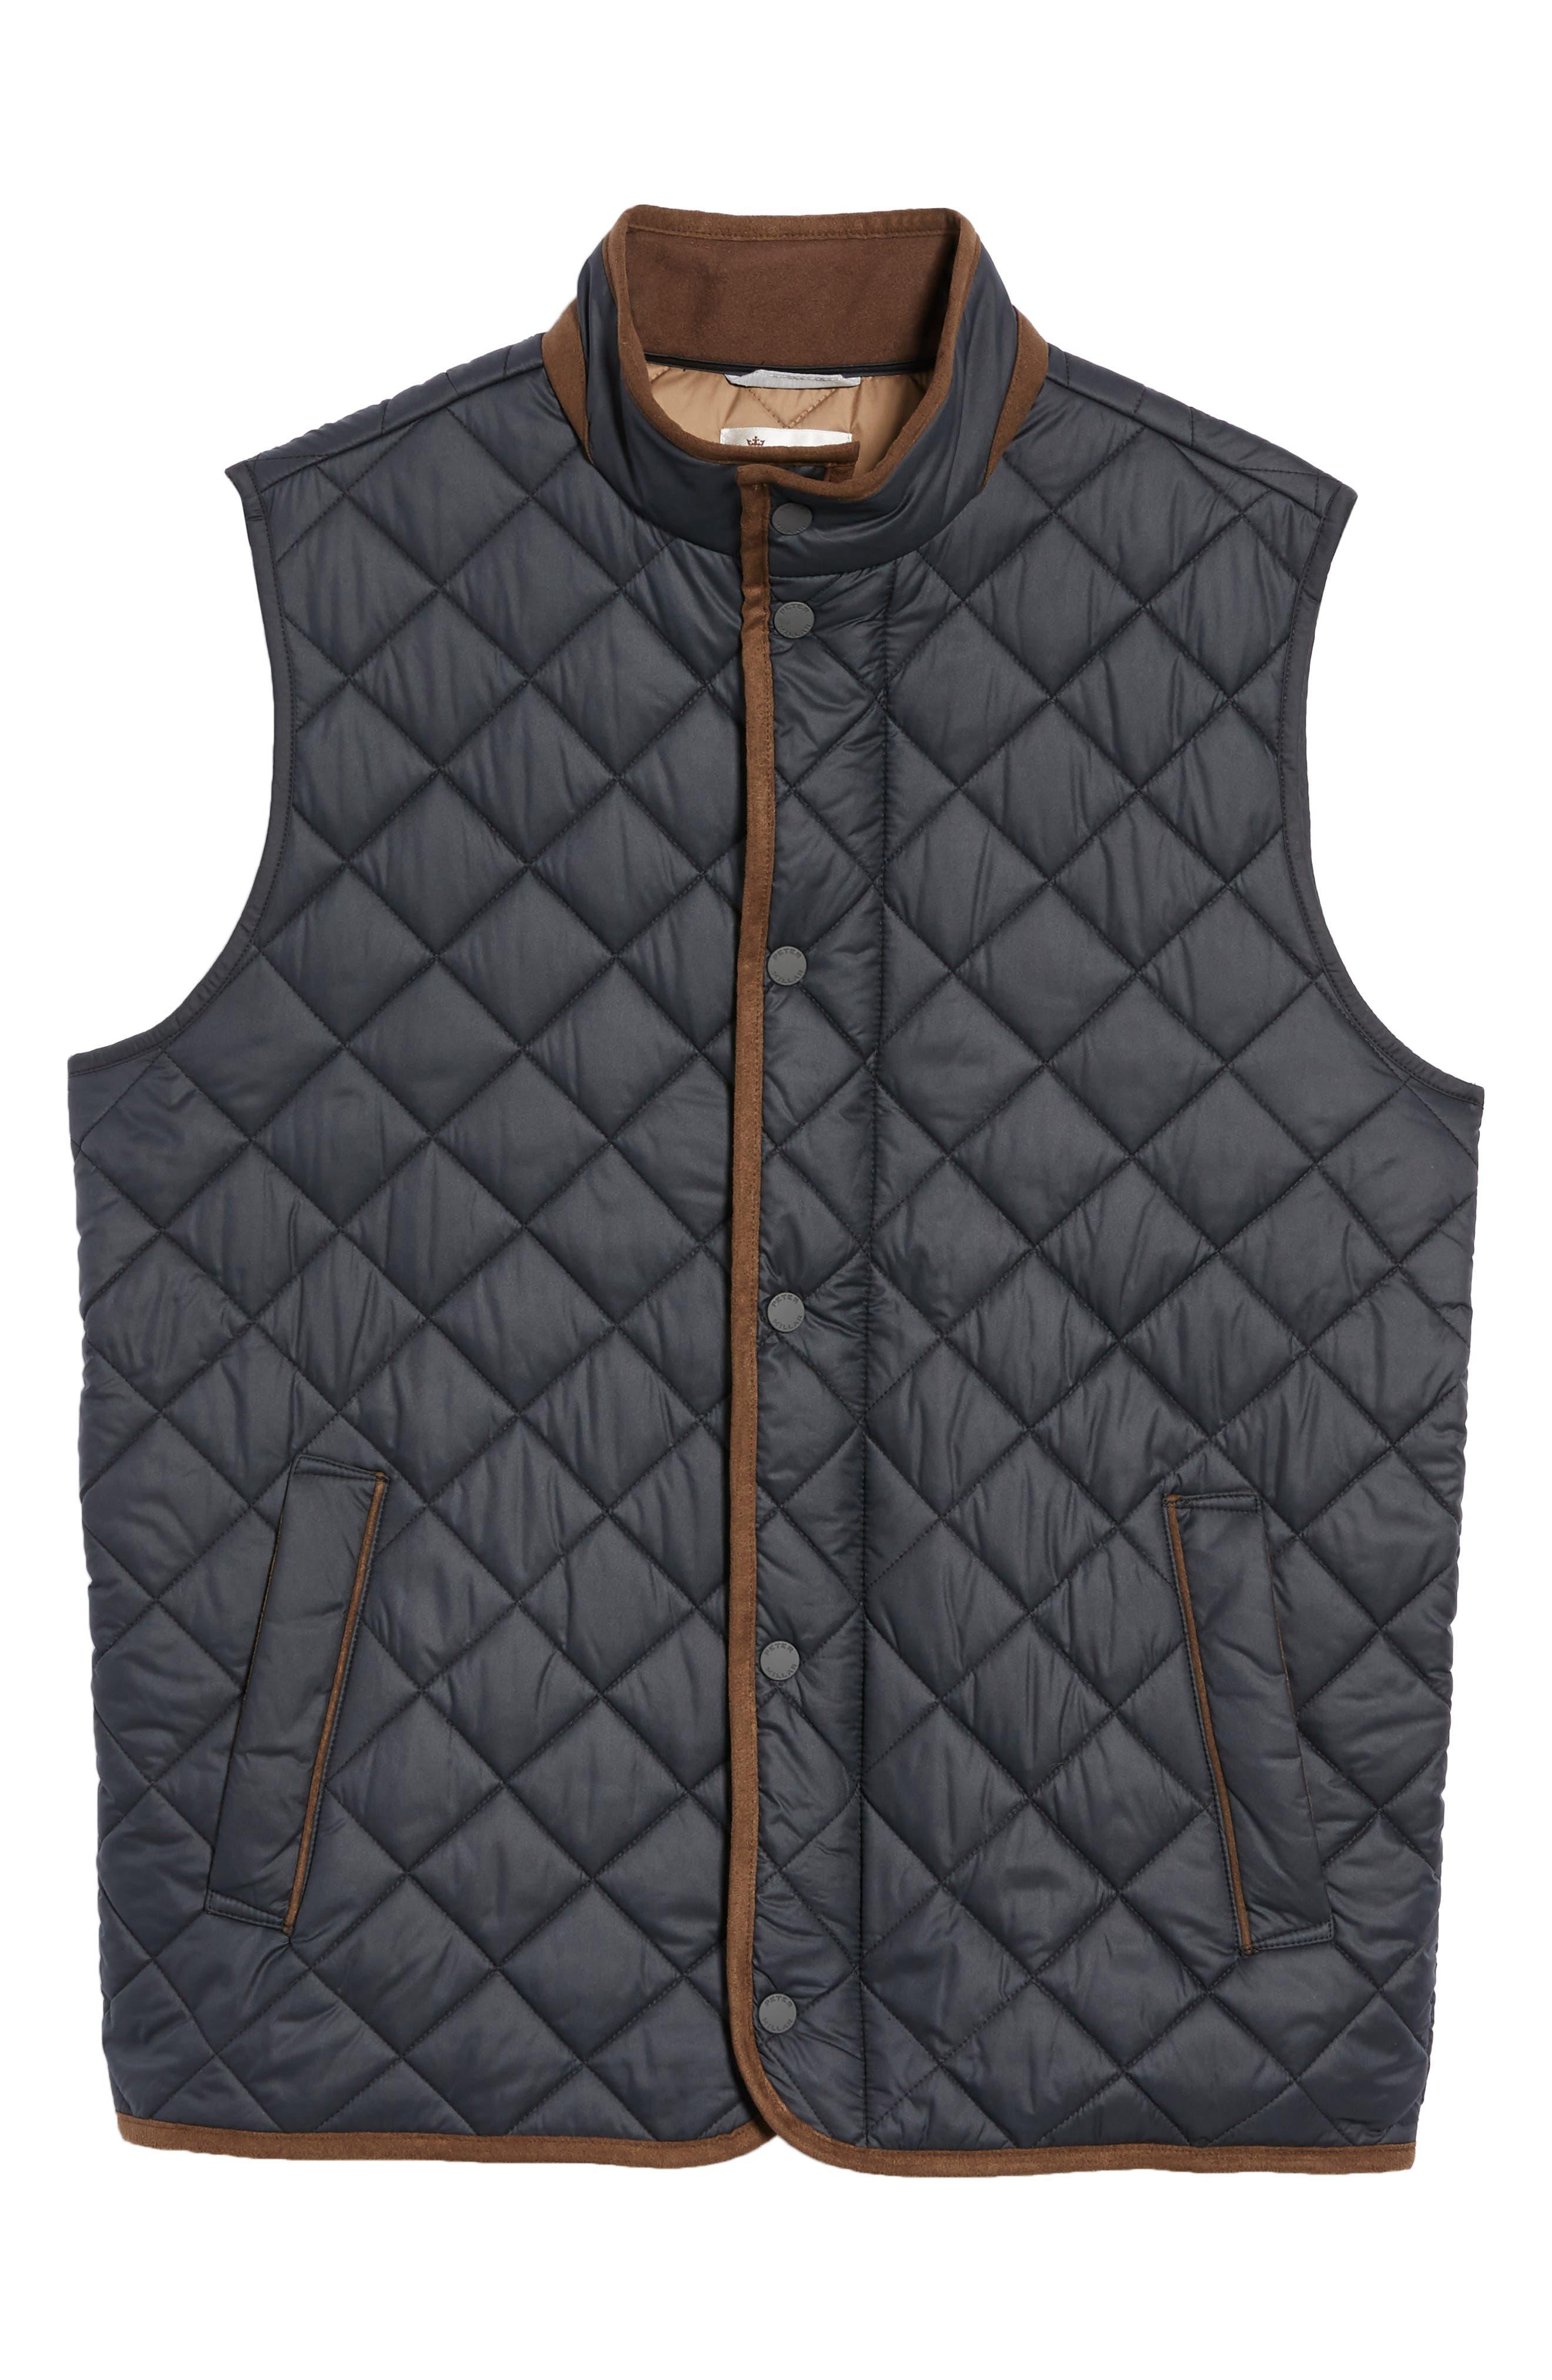 Essex Quilted Vest,                             Alternate thumbnail 5, color,                             BLACK / BLACK